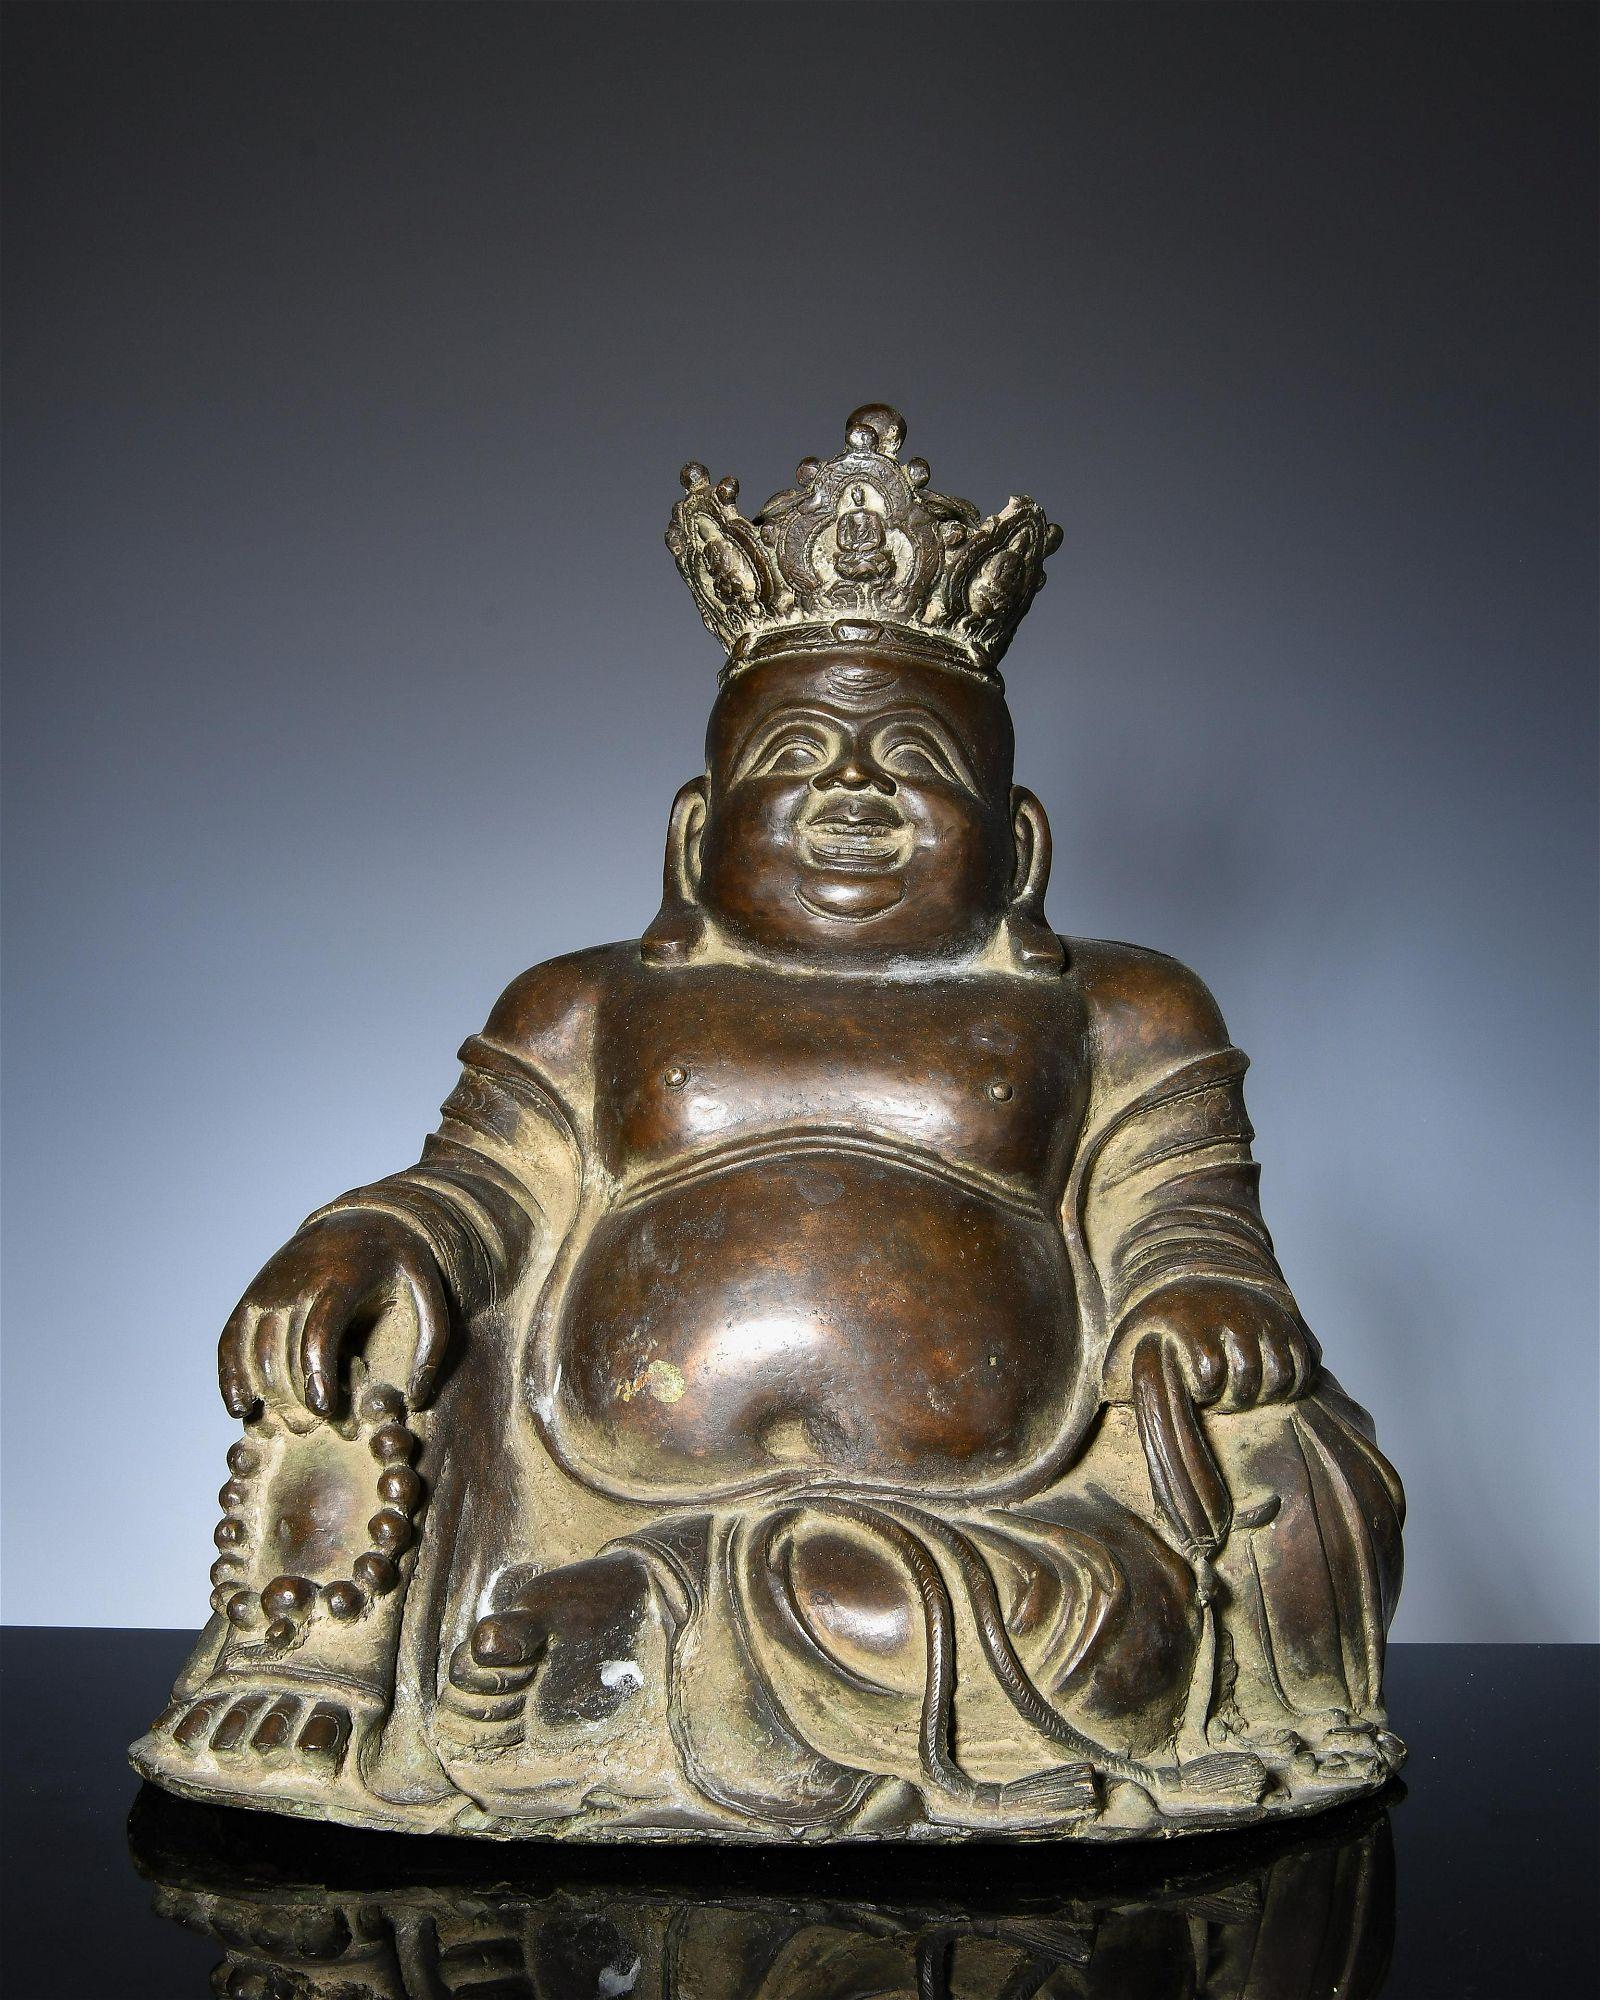 Bronze statue of Maitreya Buddha in Ming Dynasty